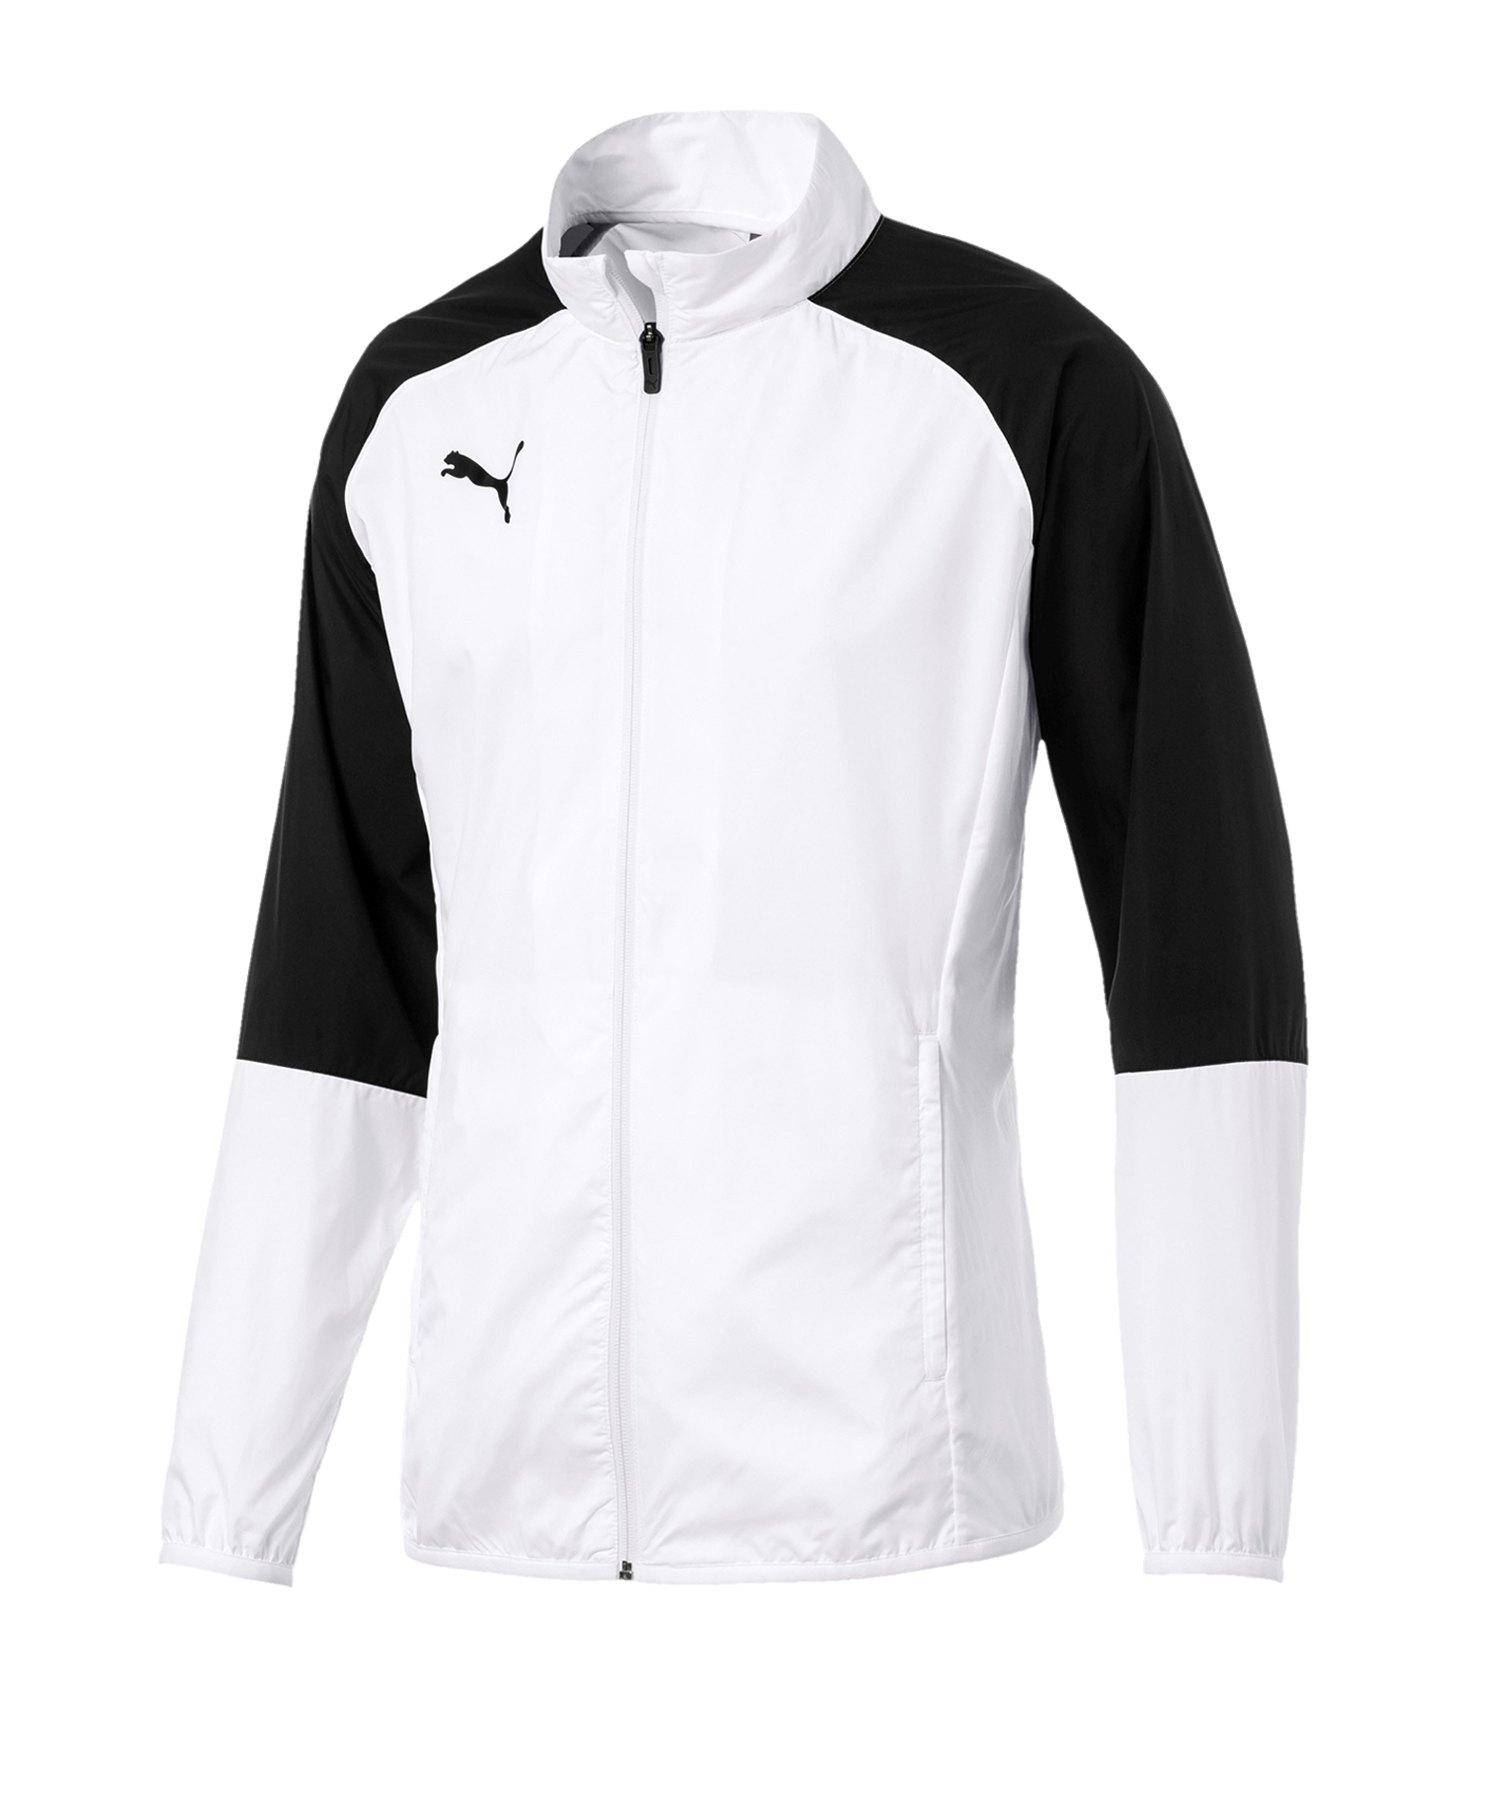 PUMA CUP Sideline Core Woven Jacket Kids Weiss F04 - weiss